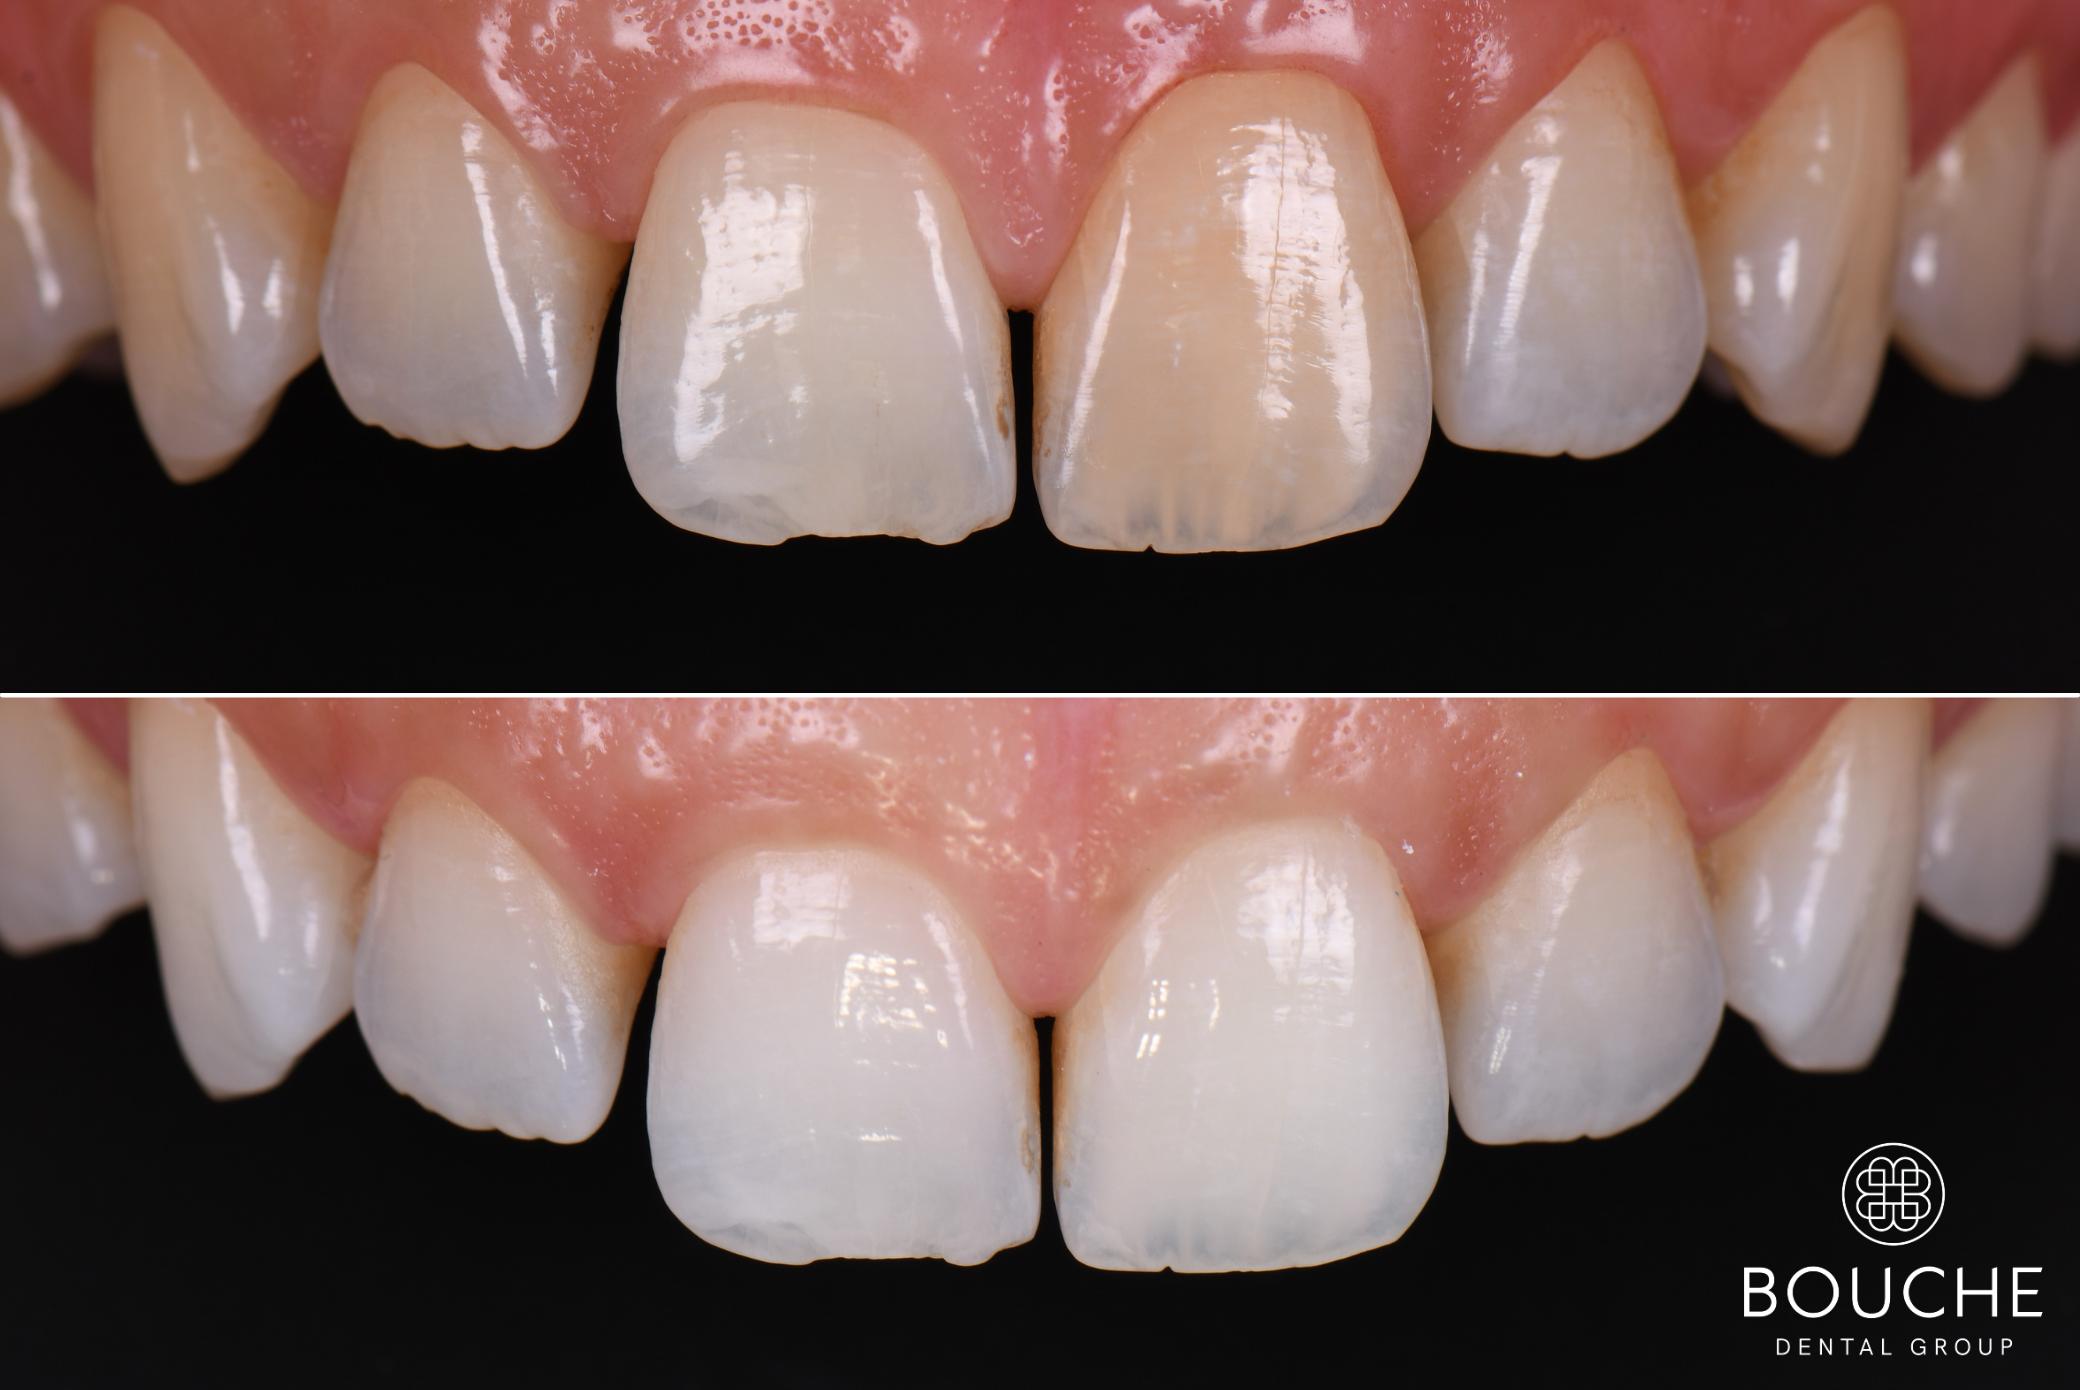 dentes brancos luxemburgo